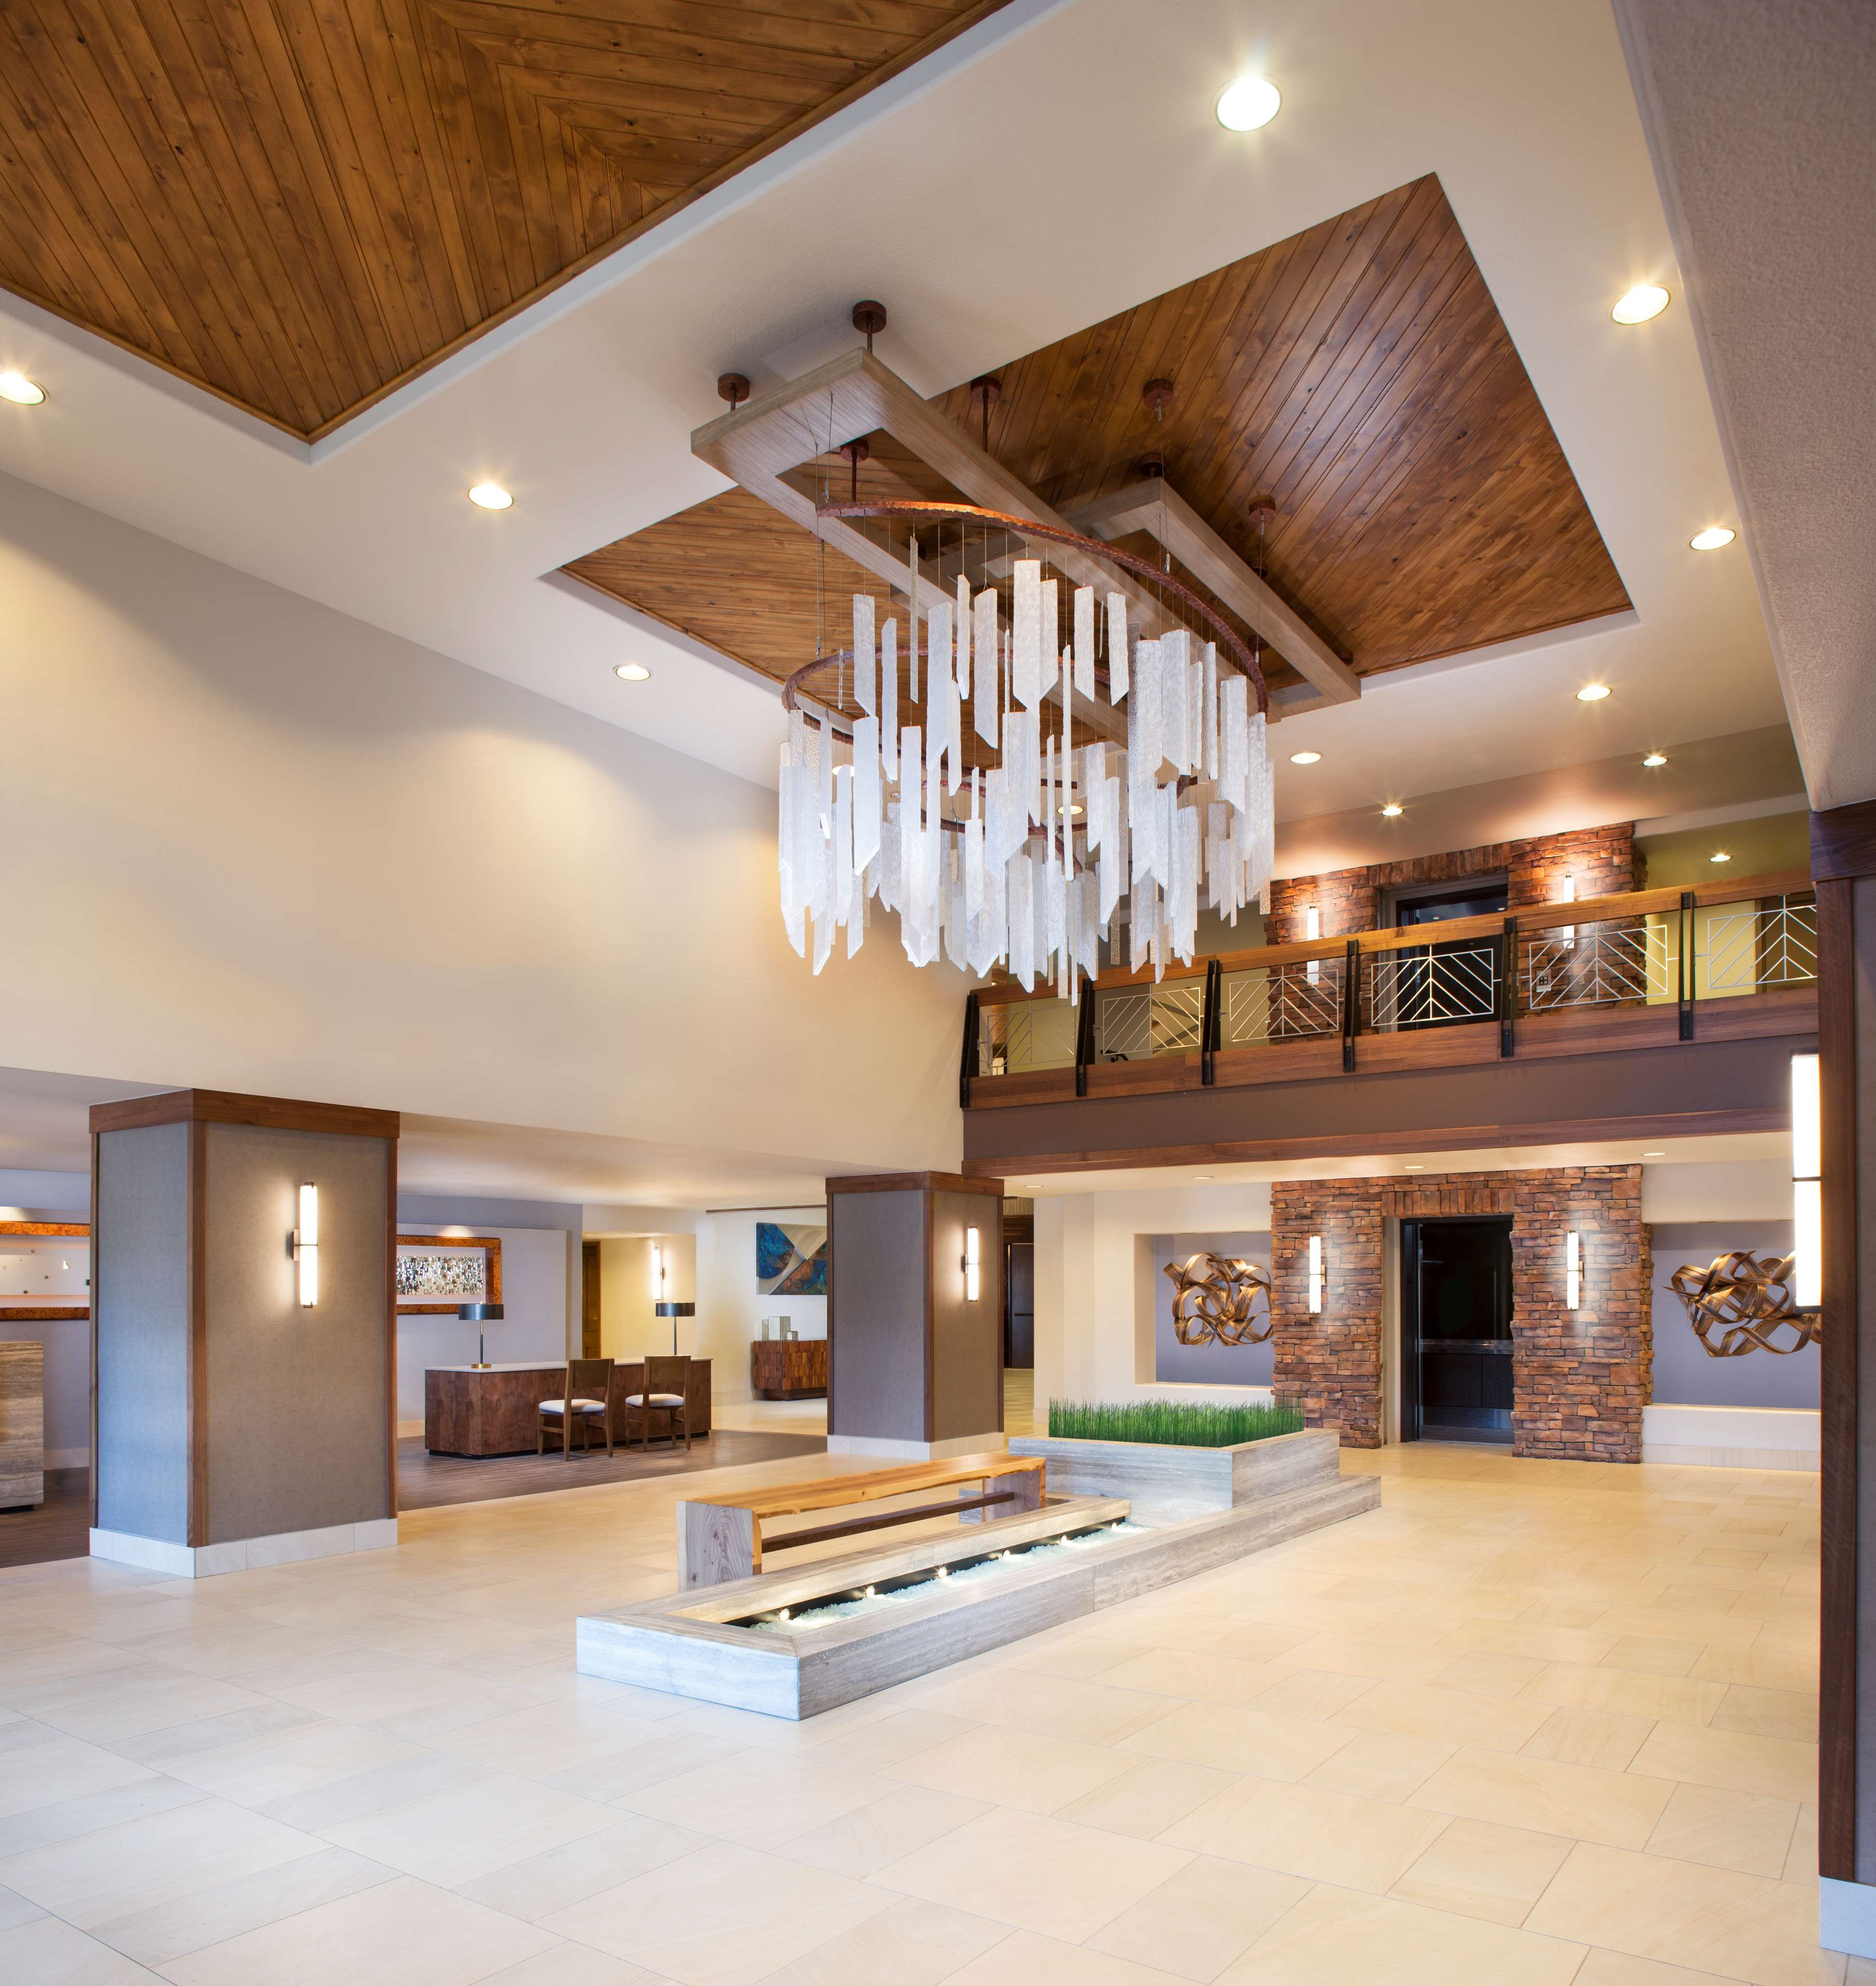 Hilton Sedona Resort at Bell Rock image 17